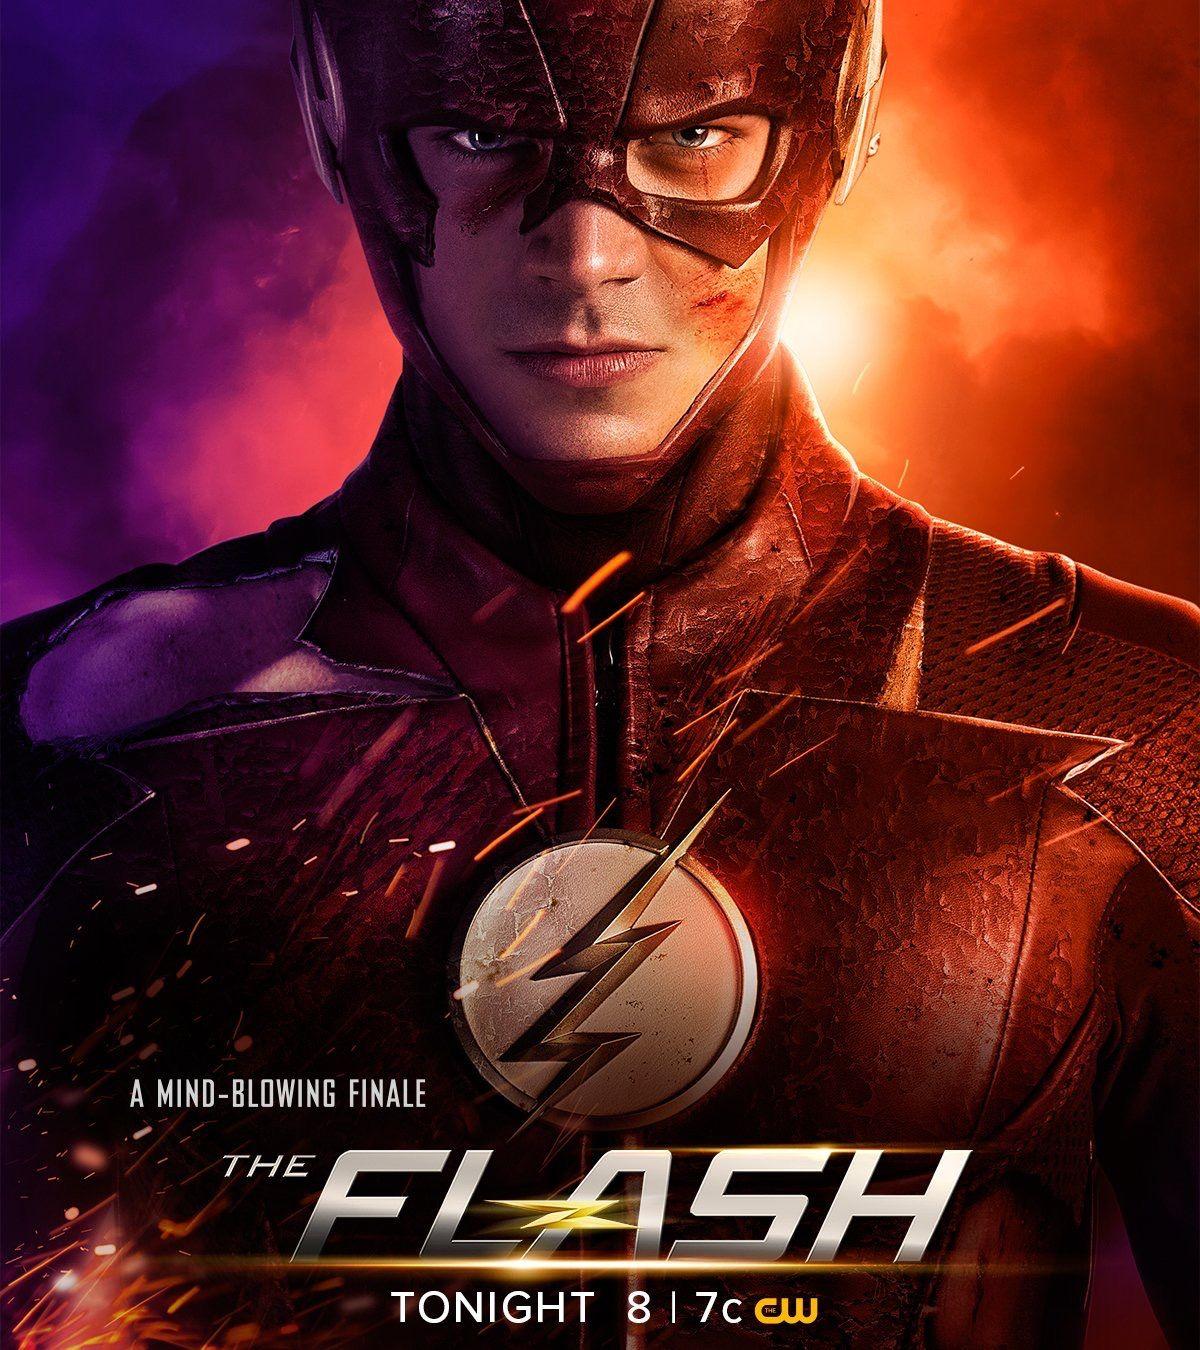 Wonderbaarlijk The Flash Barry Allen Season 1,2,3,4,5,6 (With images) | The flash SG-98